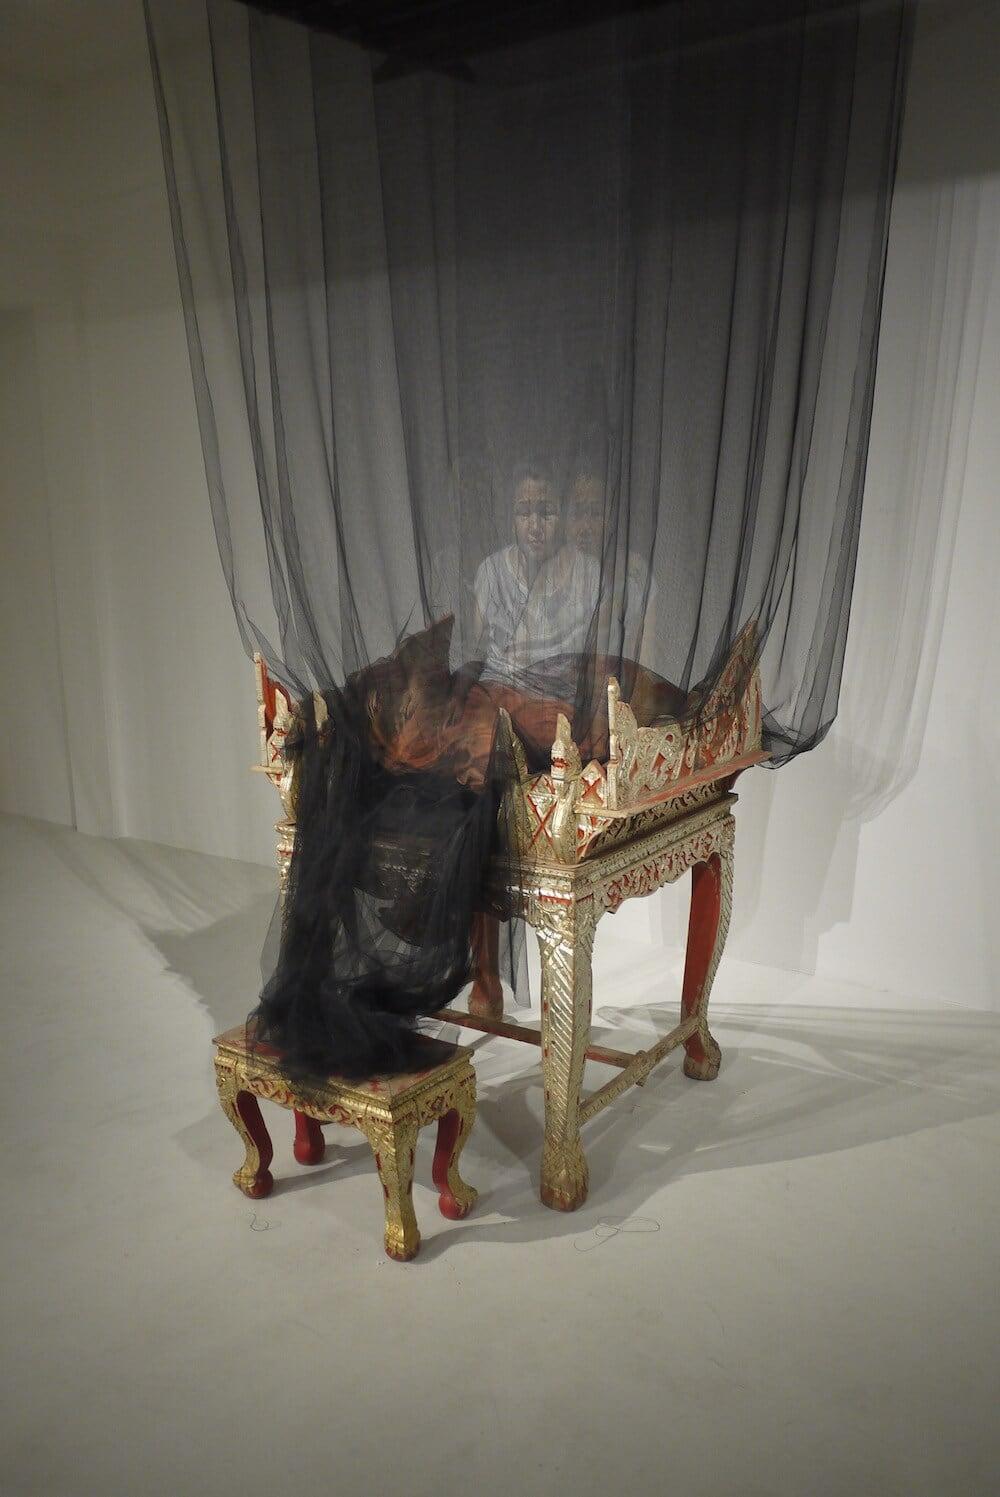 ghostly-portraits-uttaporn-nimmalaikaew-fy-3